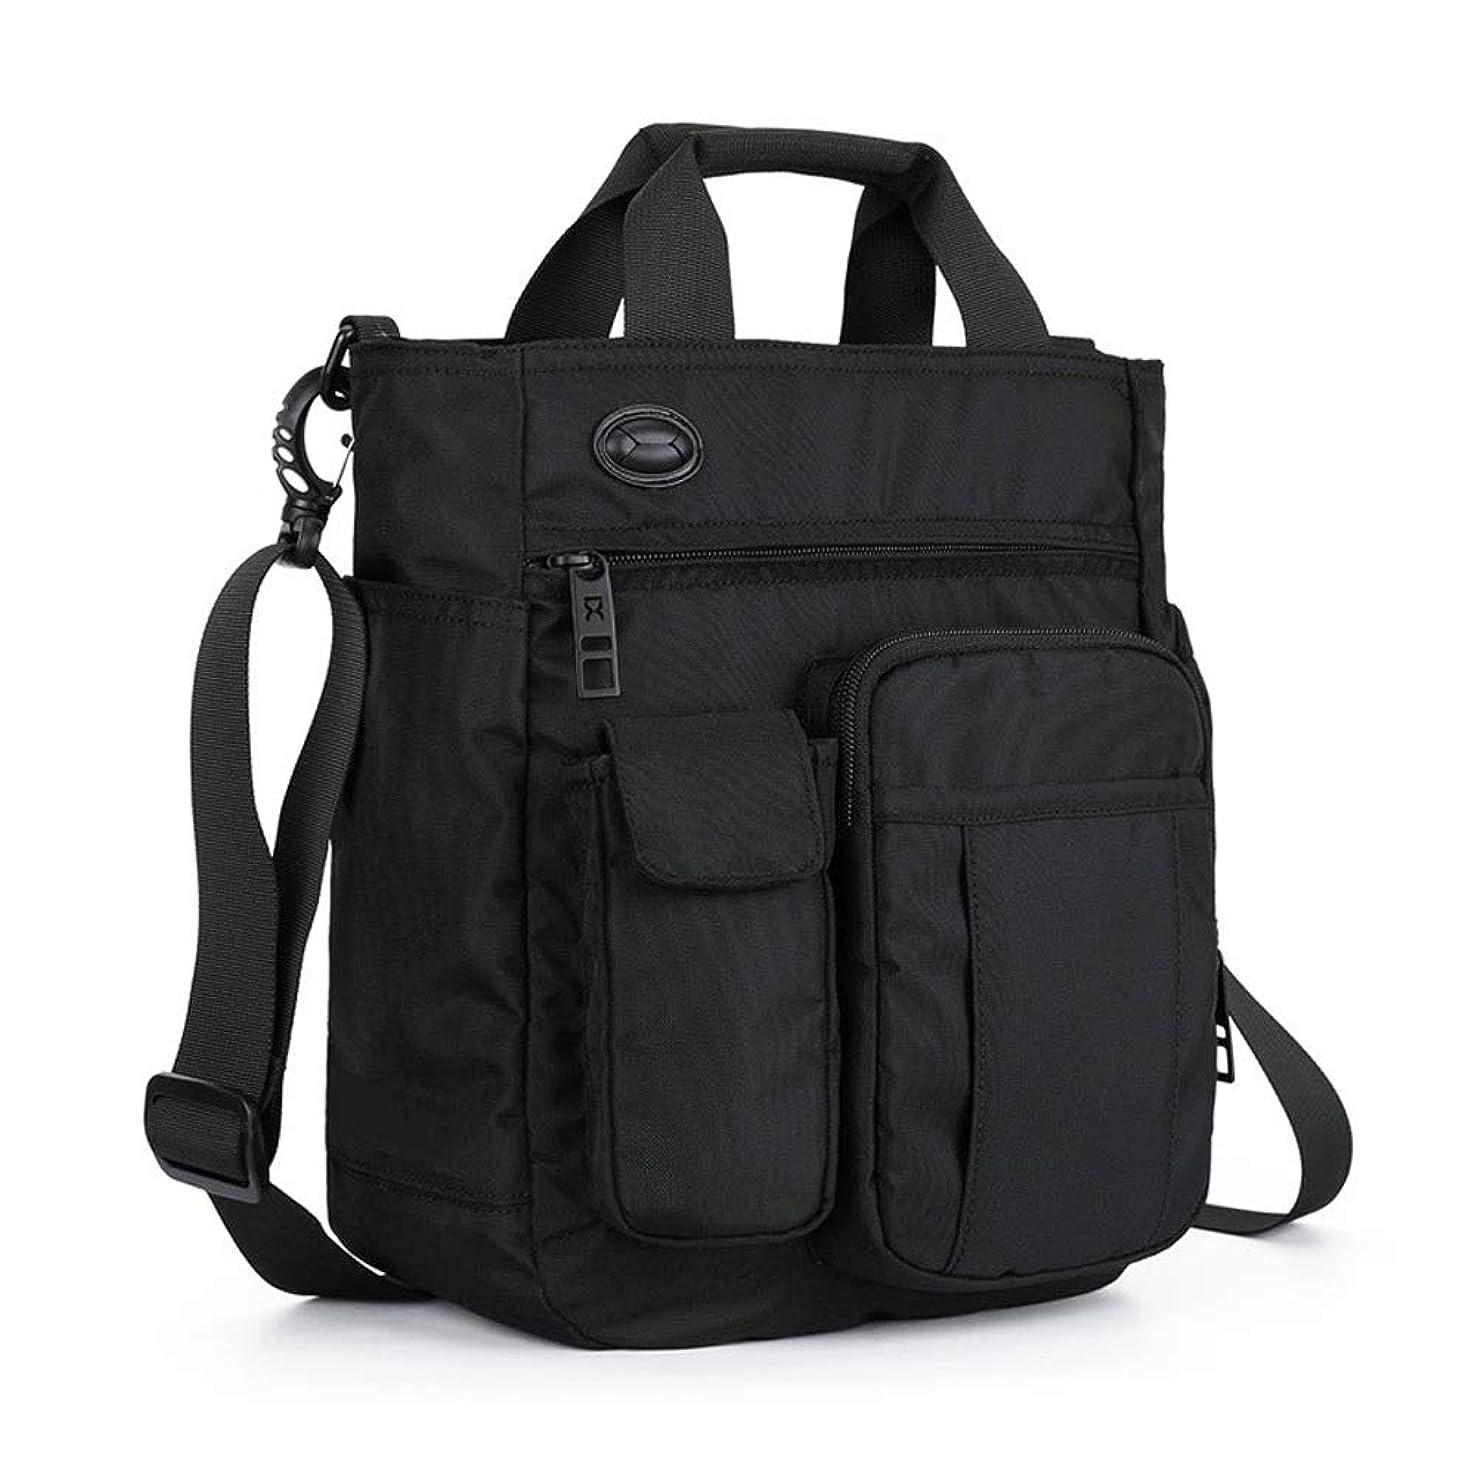 NY-close Sling Shoulder Bag Headphone Jack Waterproof Multifunction Backpack Casual Chest Bag Hiking Backpack Lightweight Sport Hiking Camping Gym Backpack Men and Women (Color : Black)